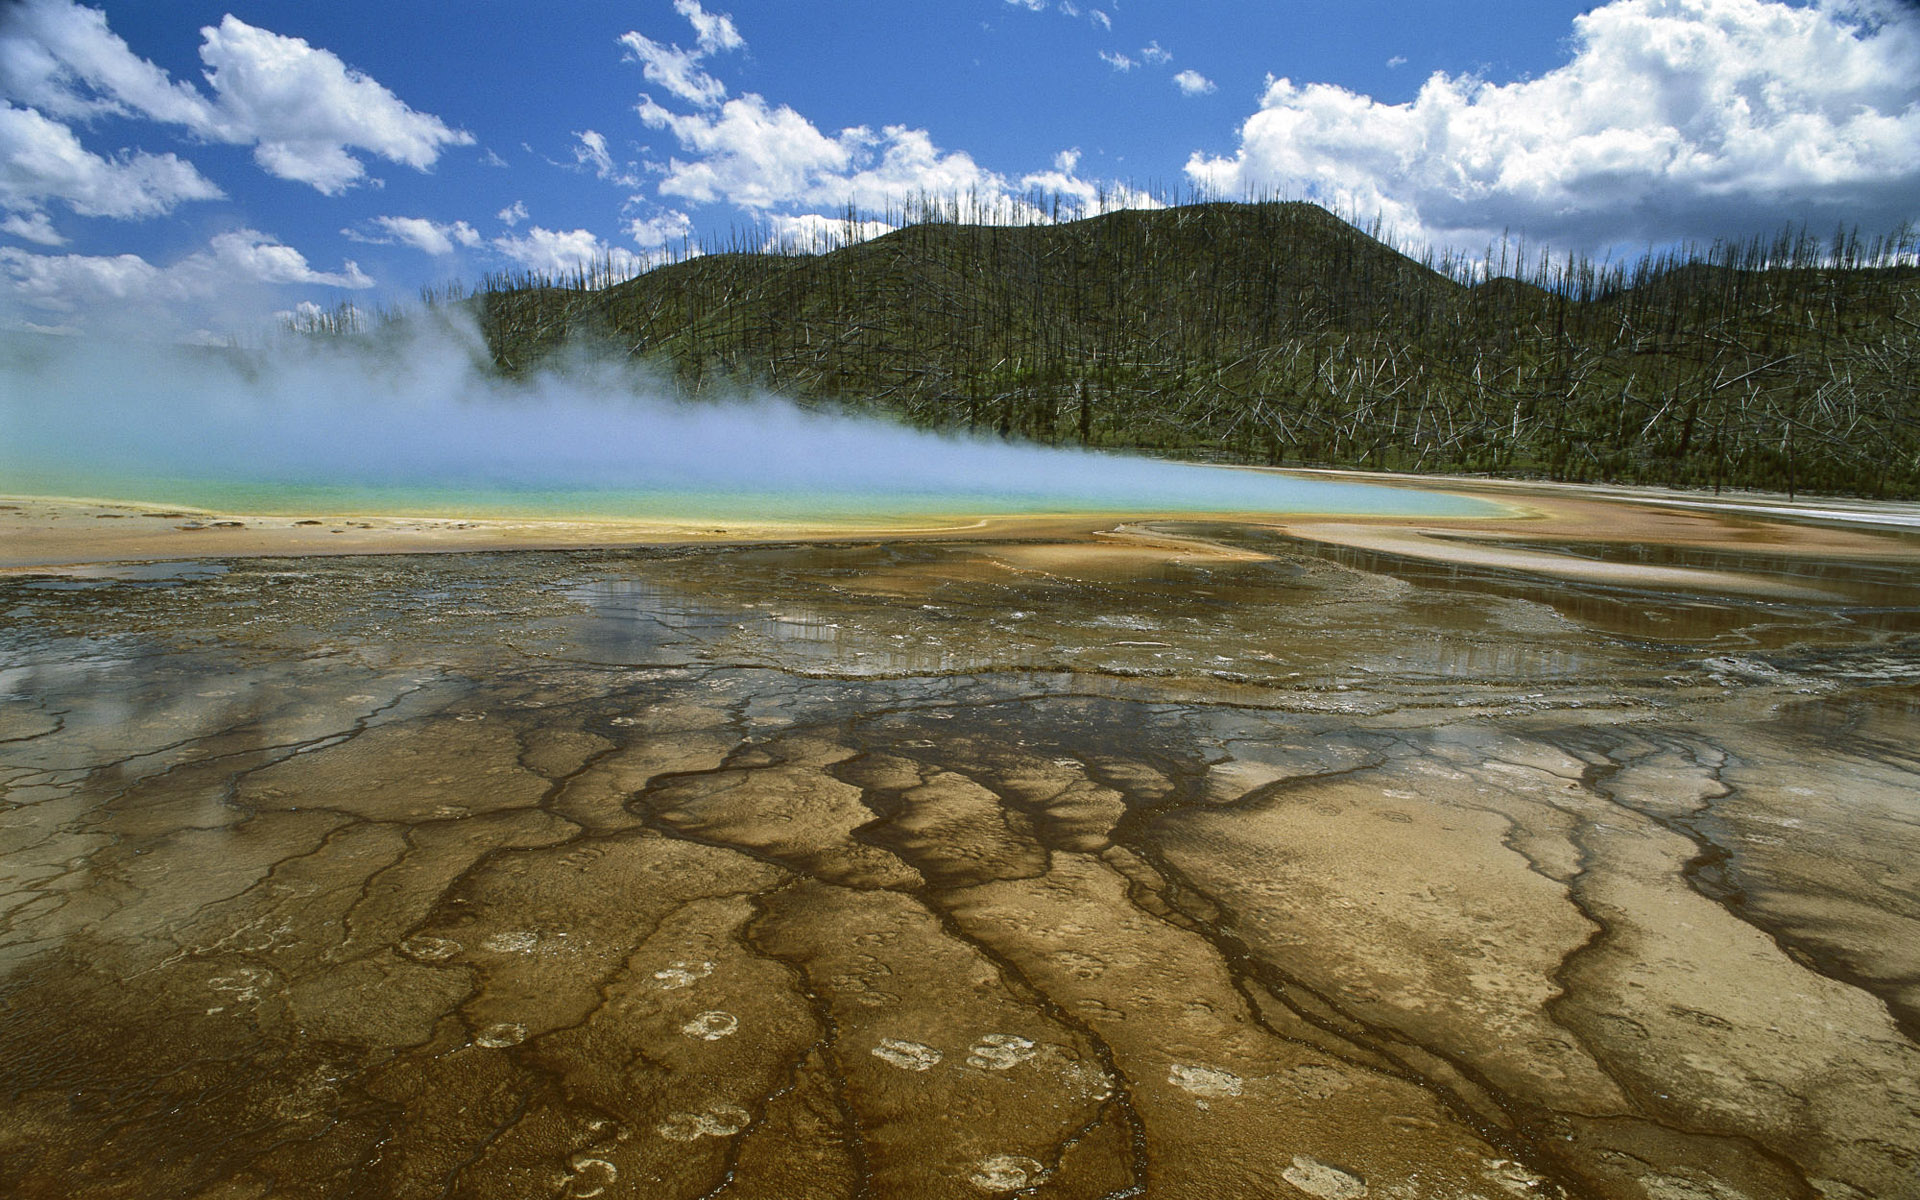 yellowstone national park hd - photo #23